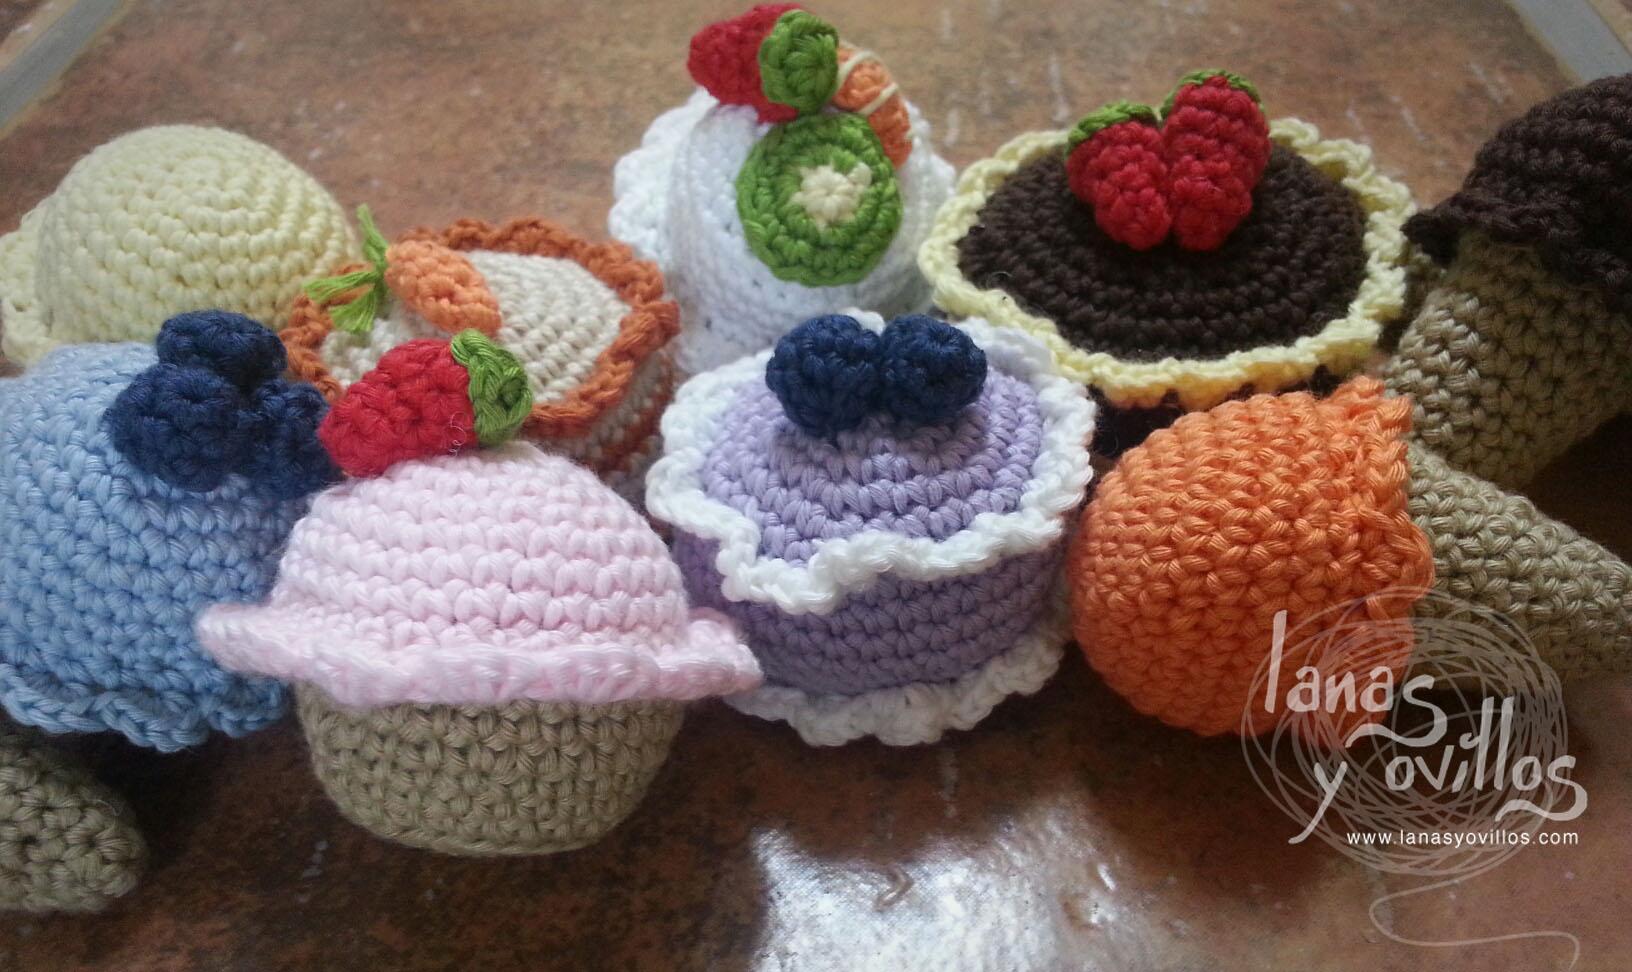 mini sweets amigurumi crochet free pattern with video tutorial